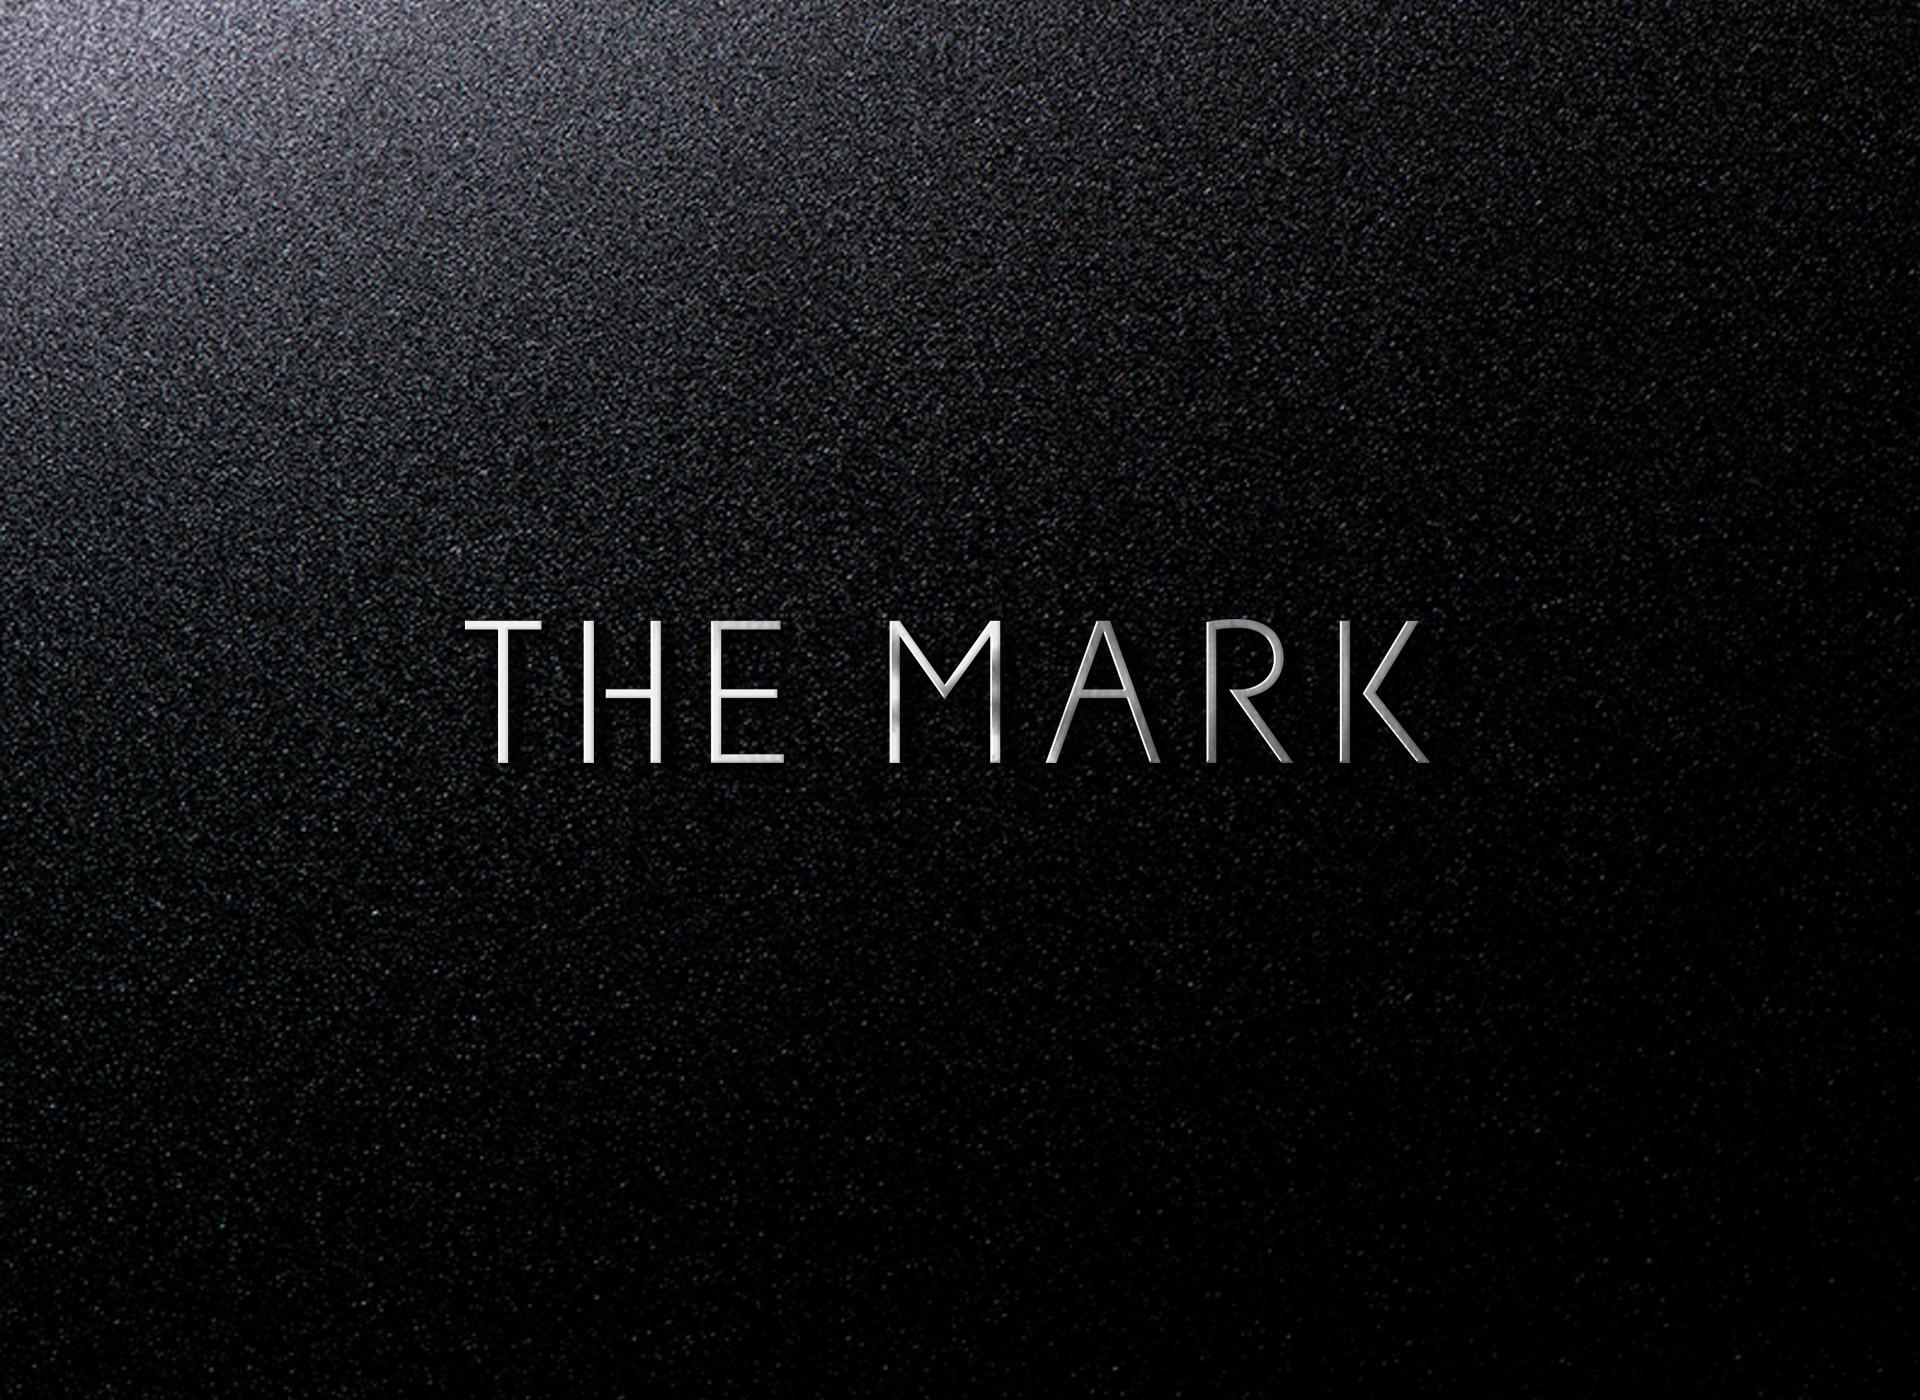 the mark portfolio inoveo business cards